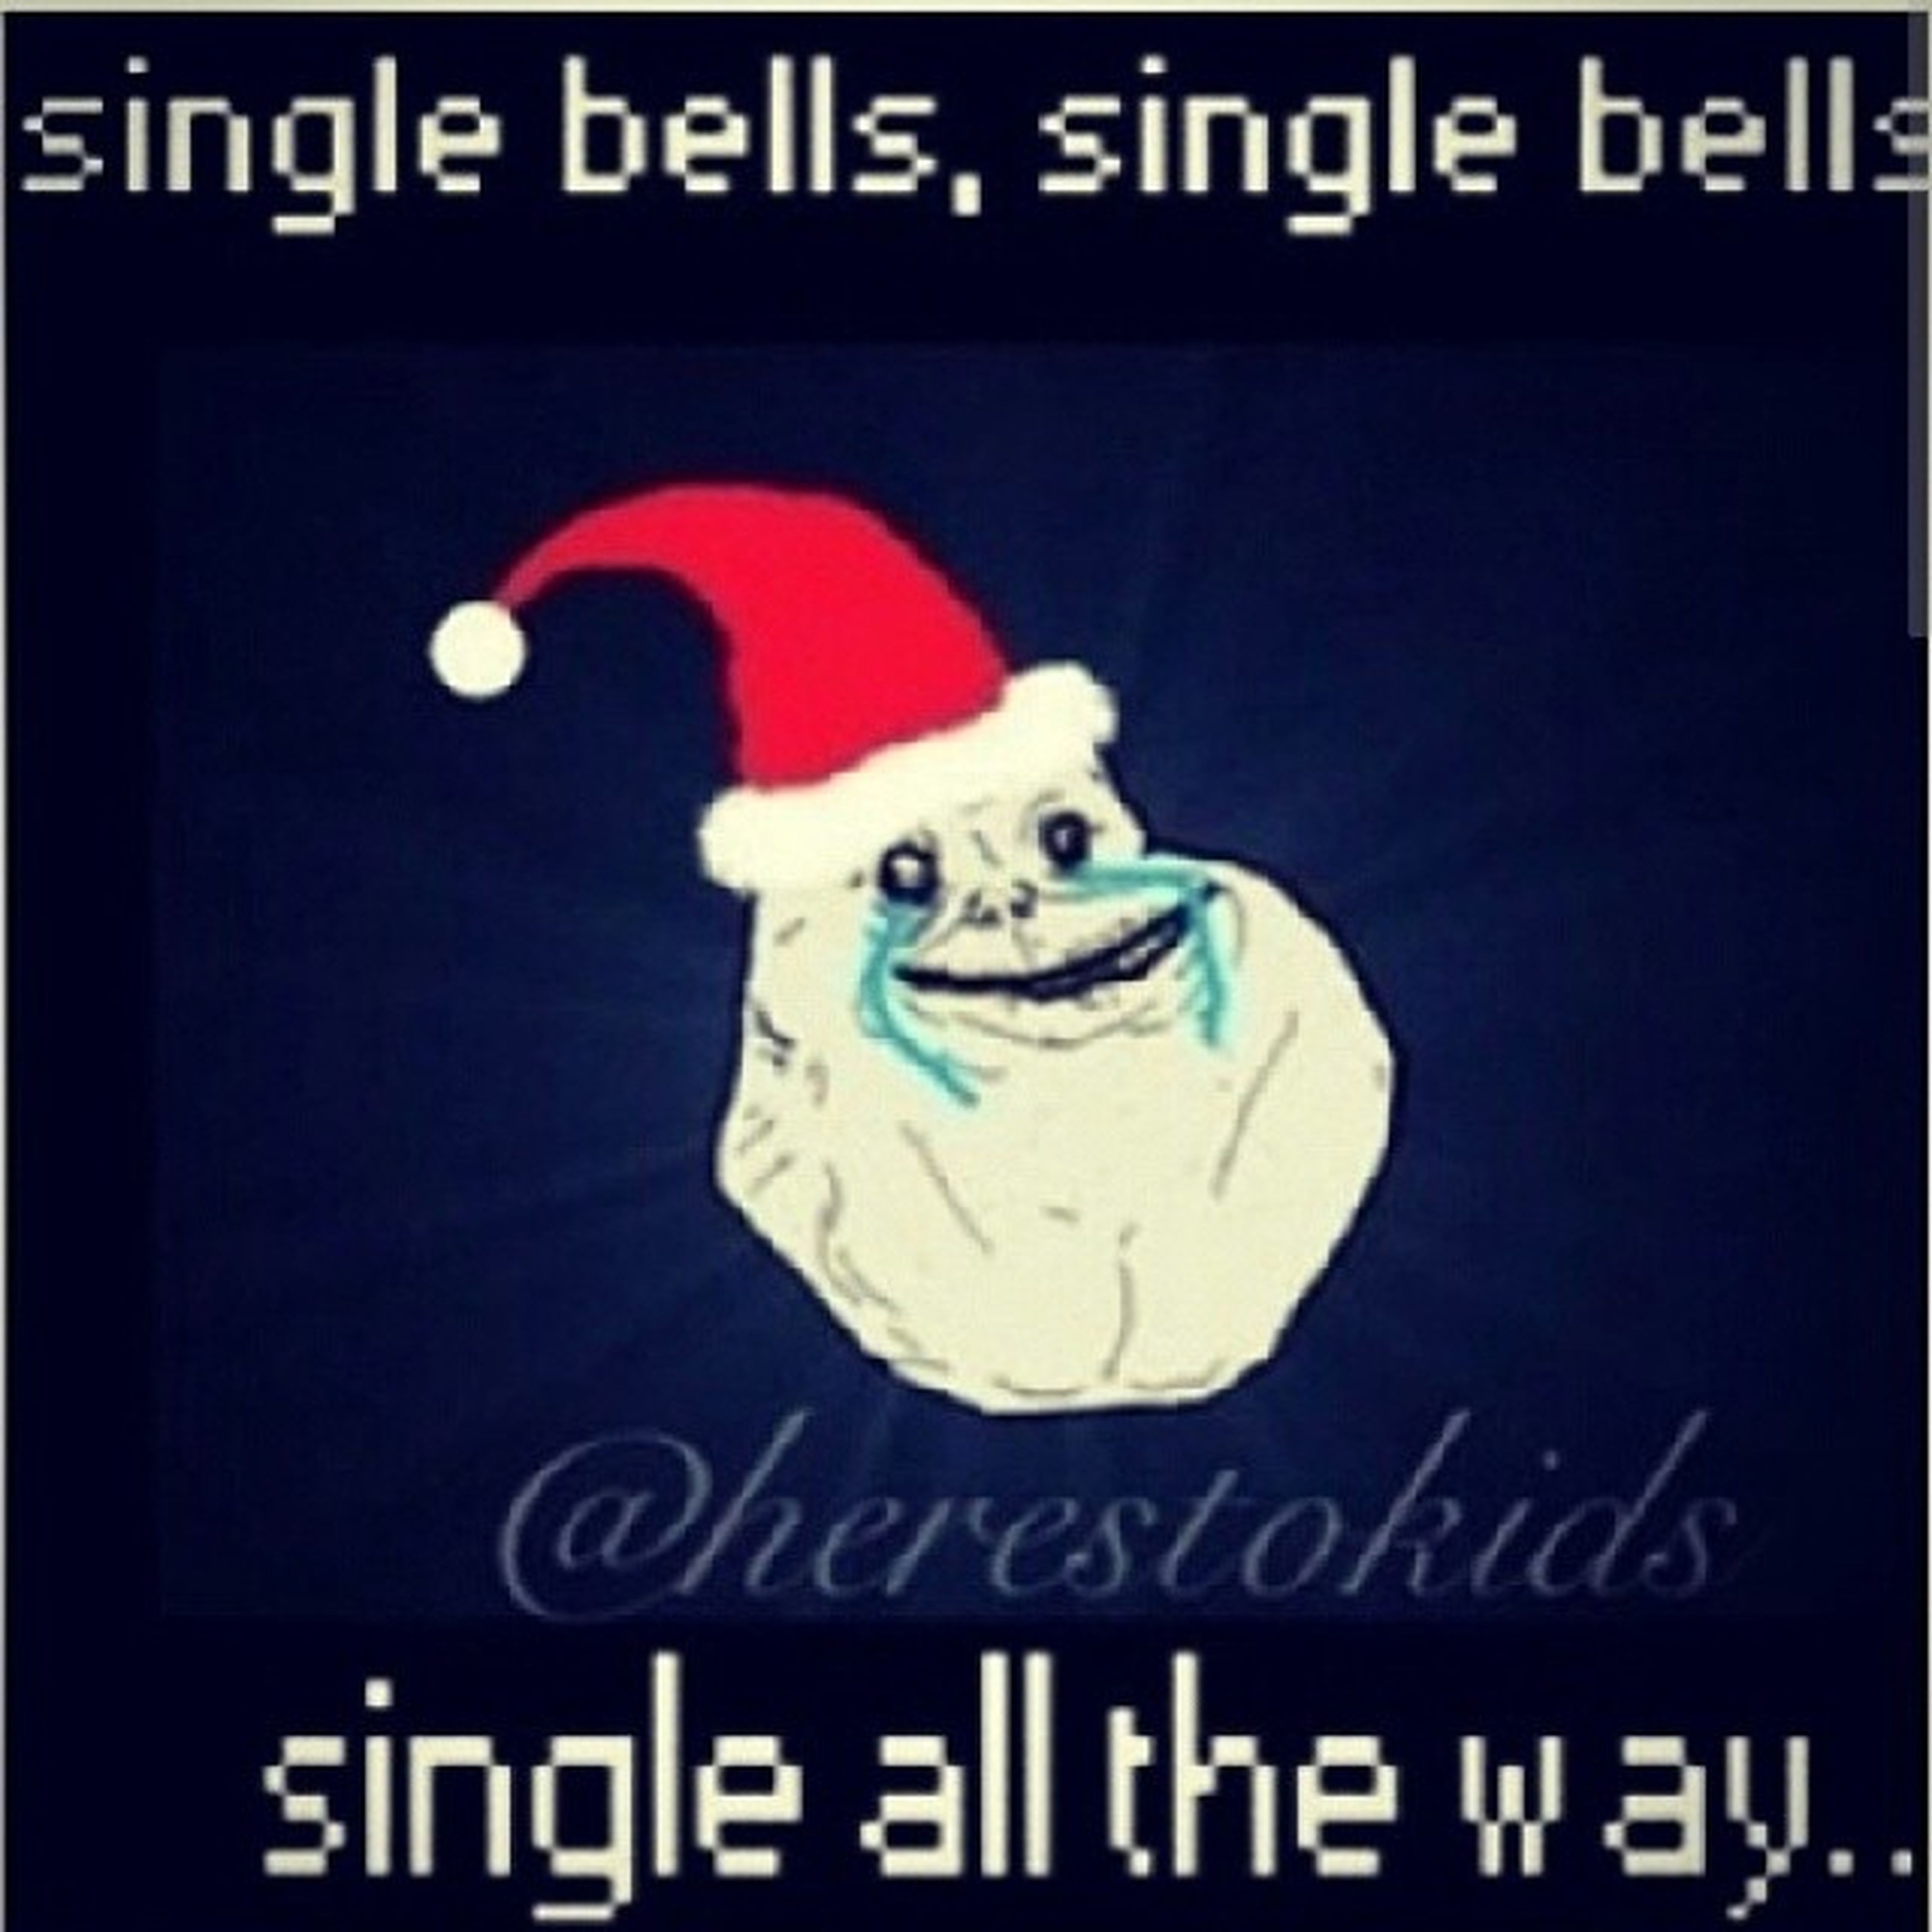 xD Singlebells